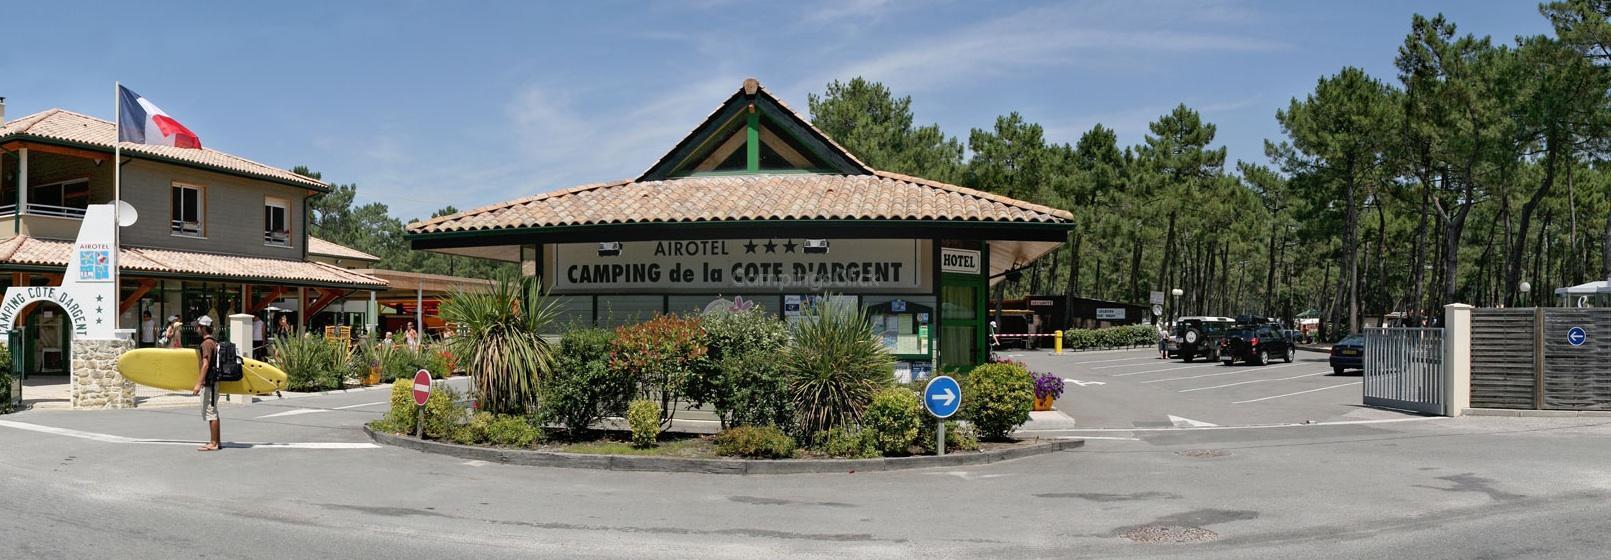 AIROTEL Camping De La Cote D'argent